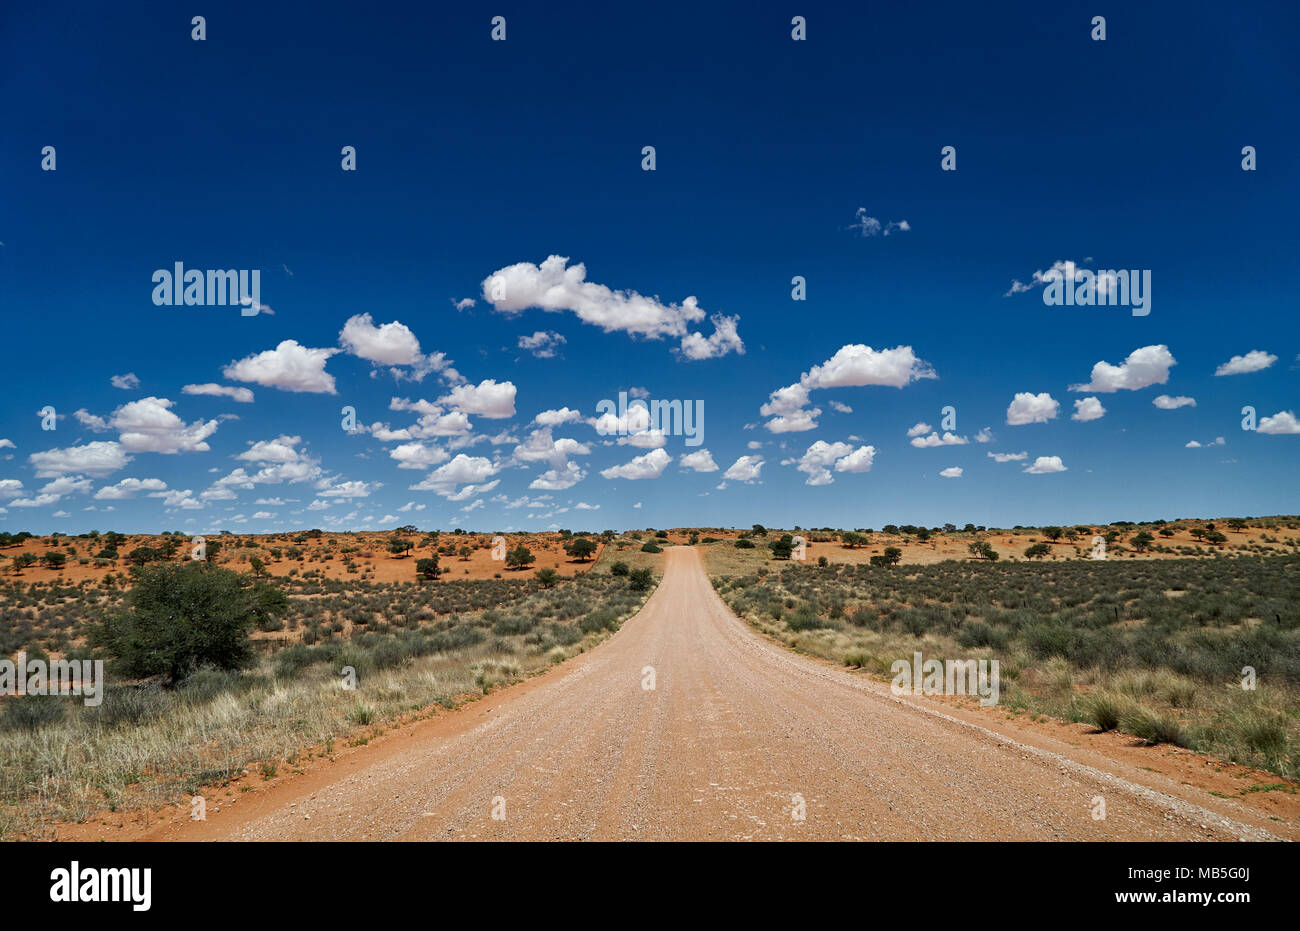 straight gravel road through dunes of Kalahari, Namibia, Africa - Stock Image